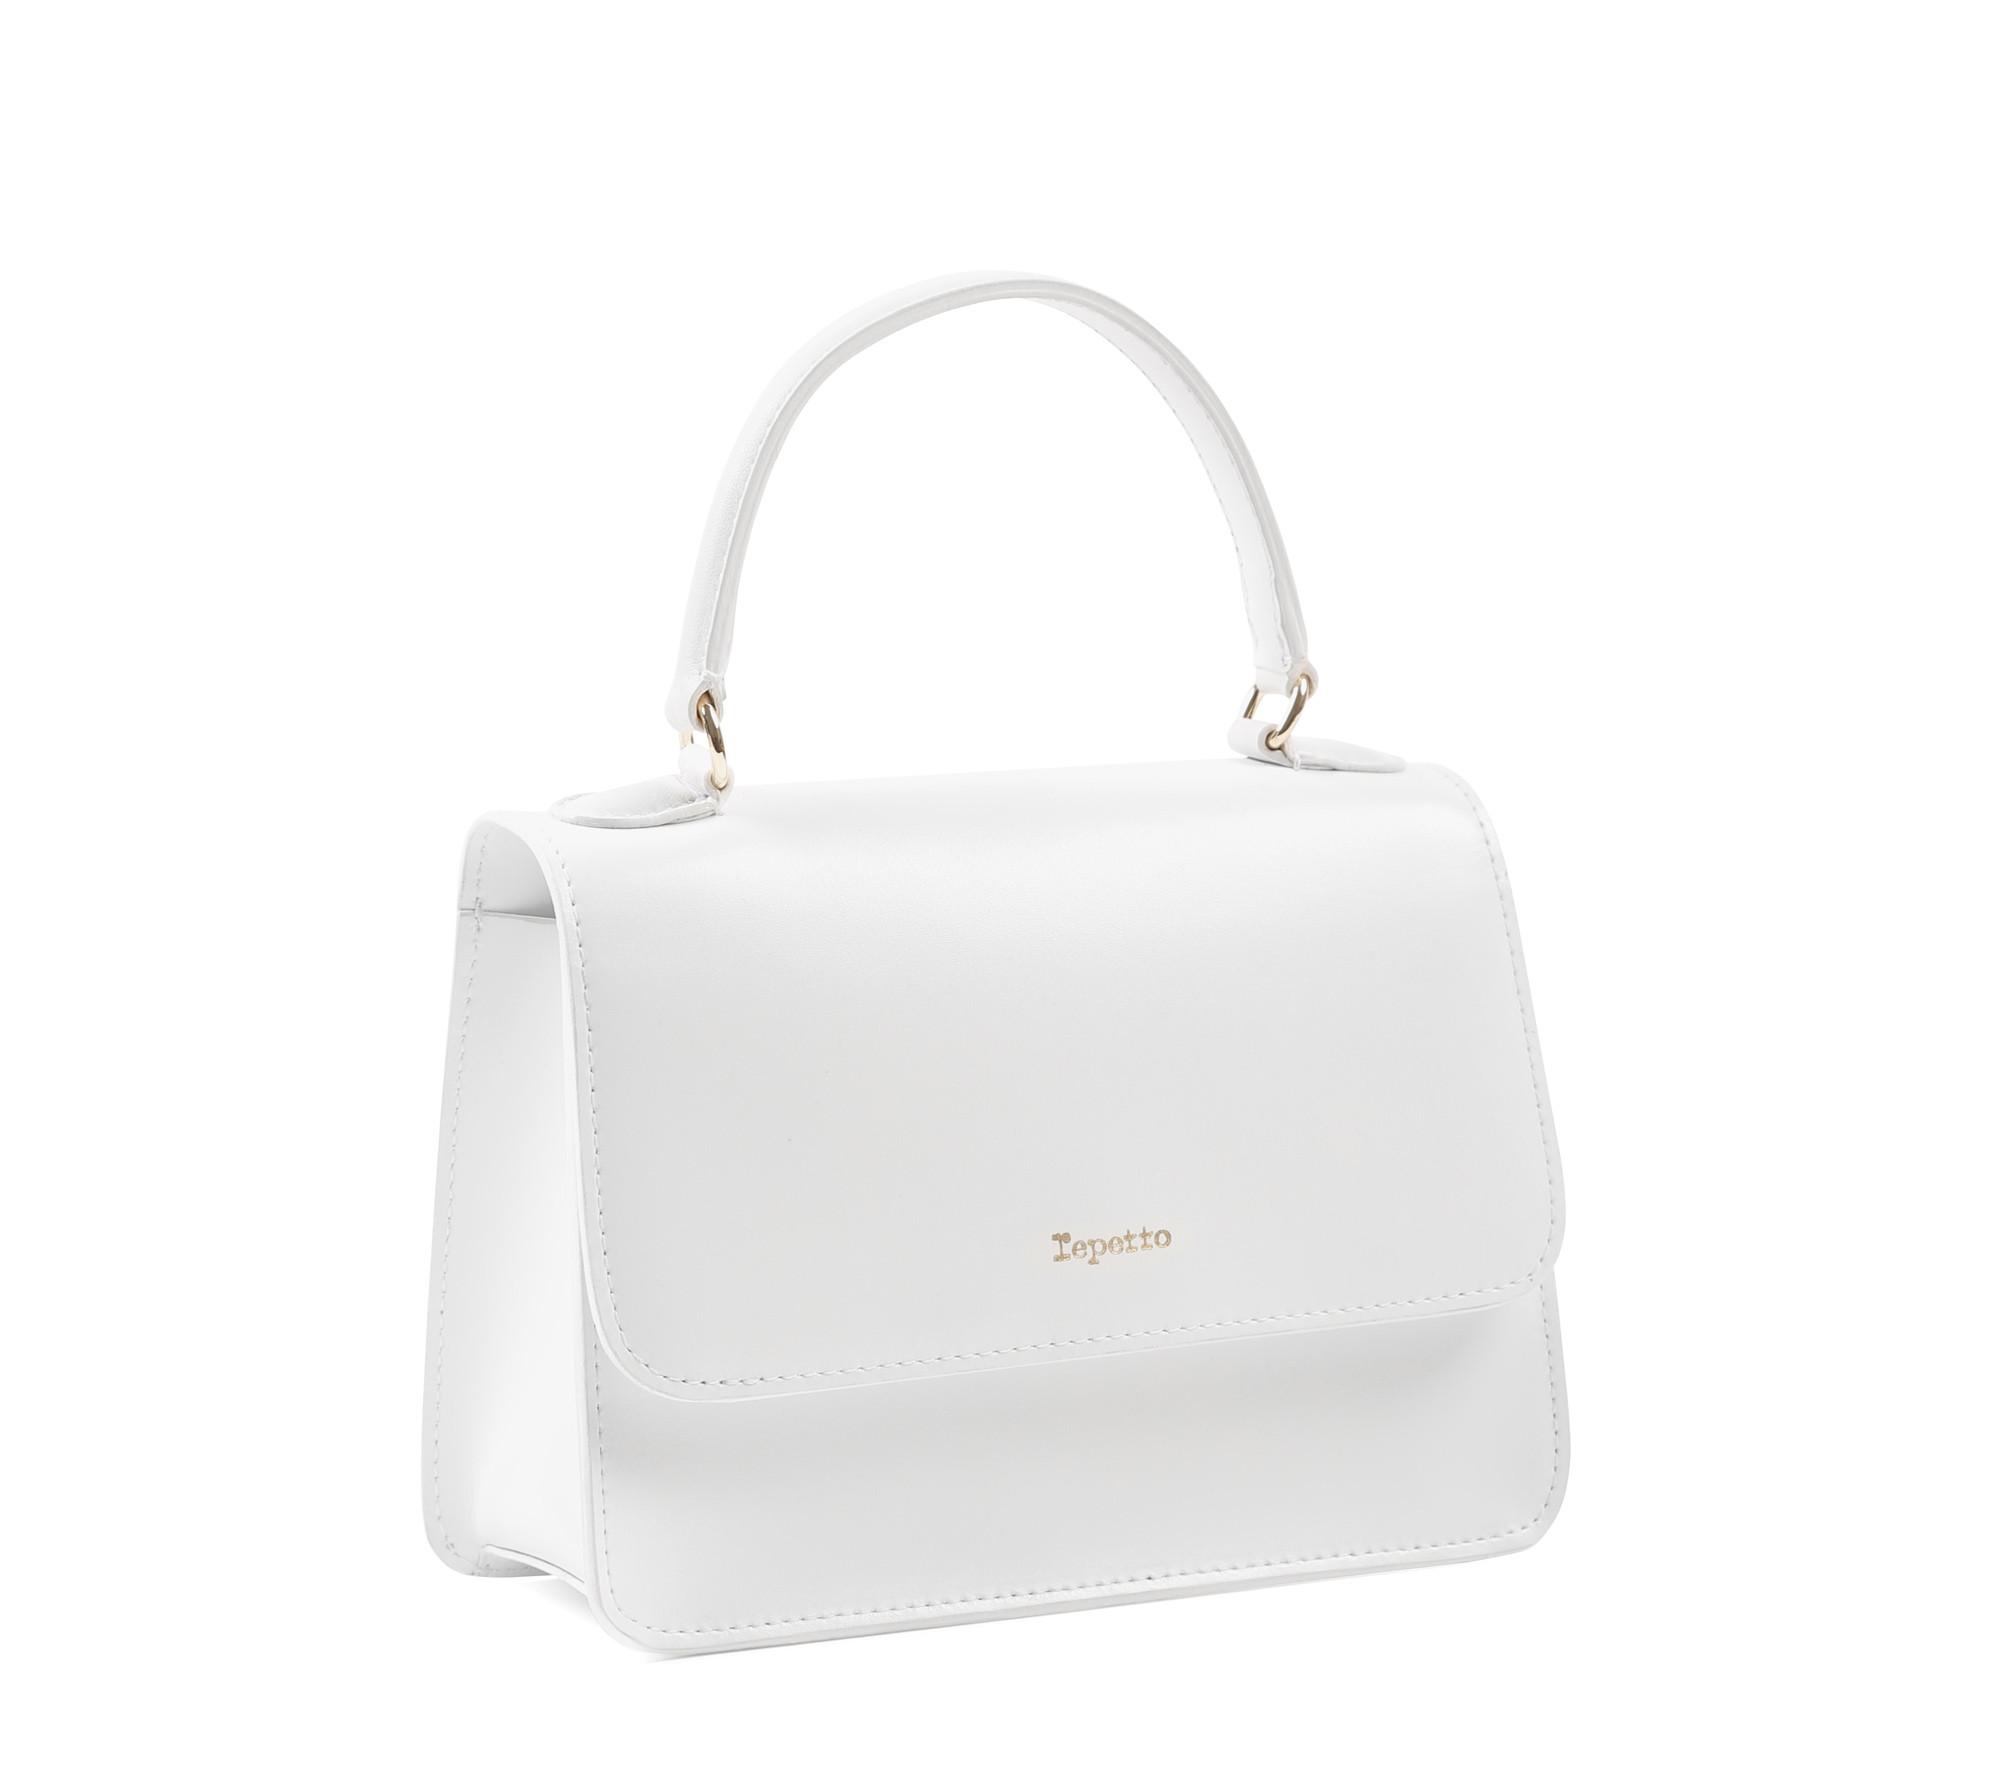 Double Jeu bag Small size